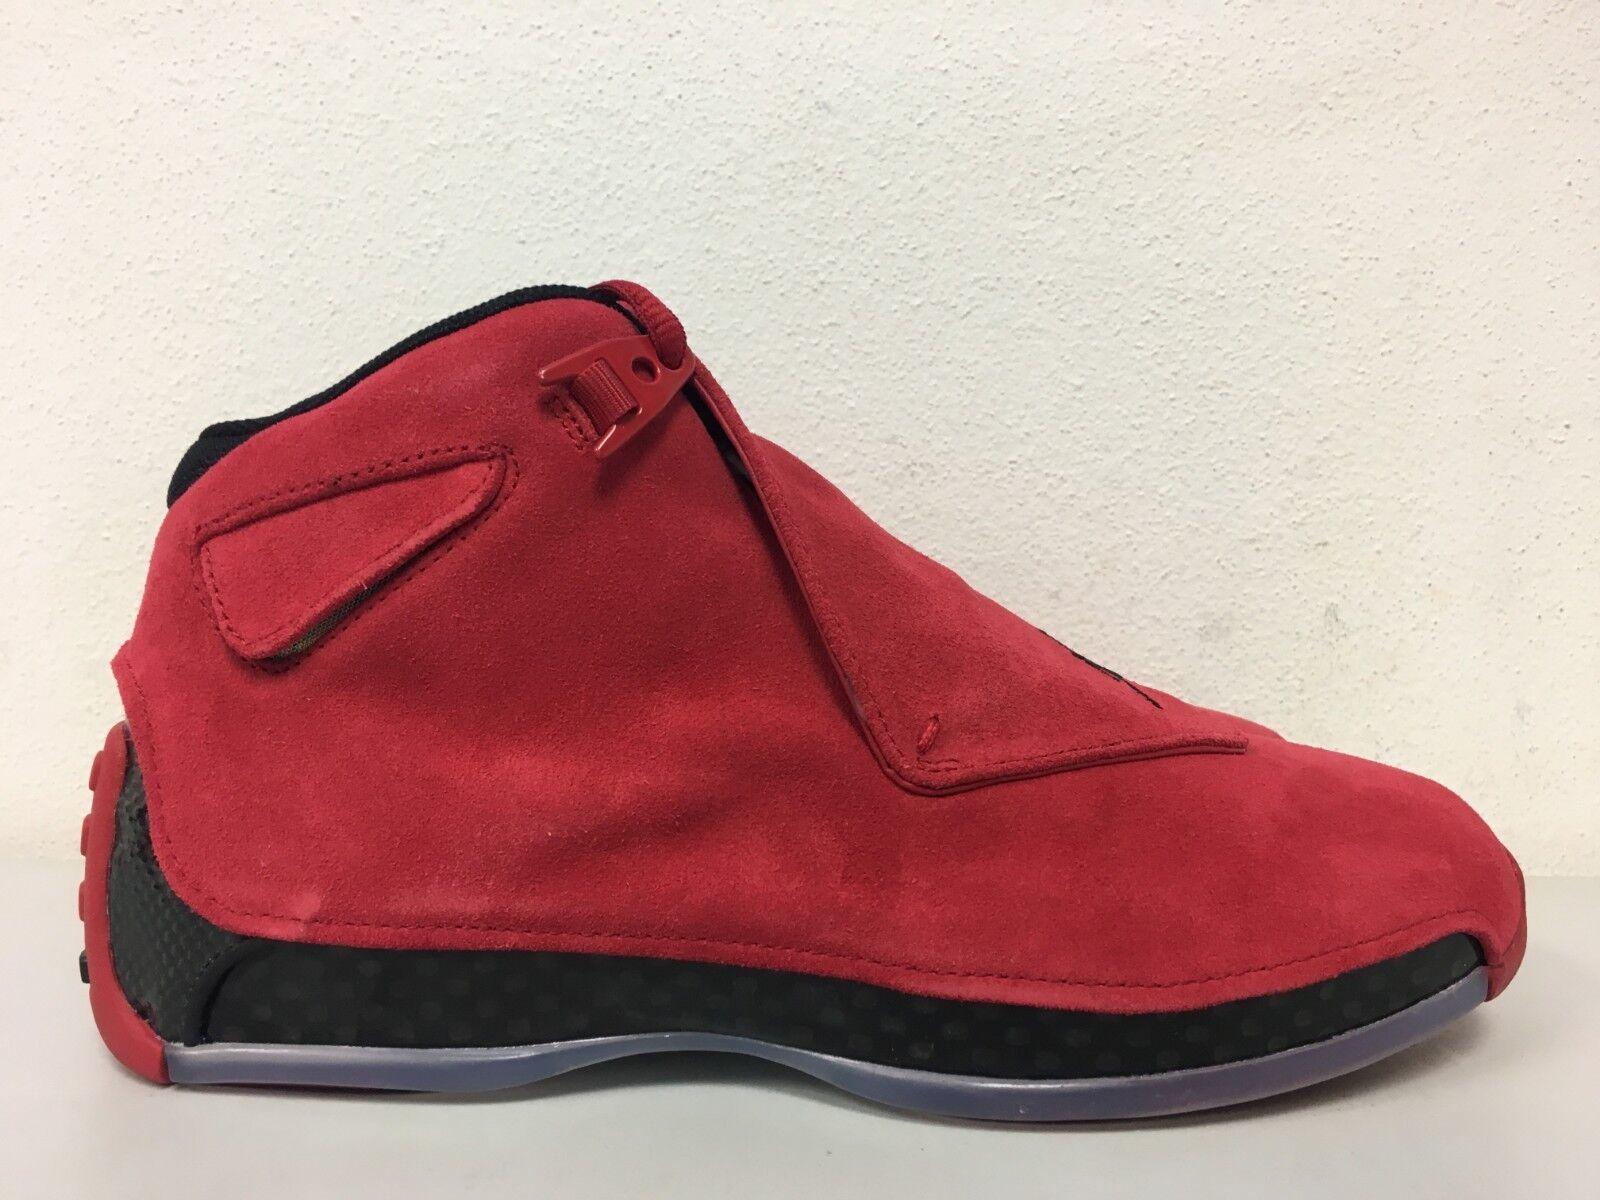 Nike Air Jordan 18 Retro XVIII Tgold Gym Red Suede Black AA2494-601 Size 8.5